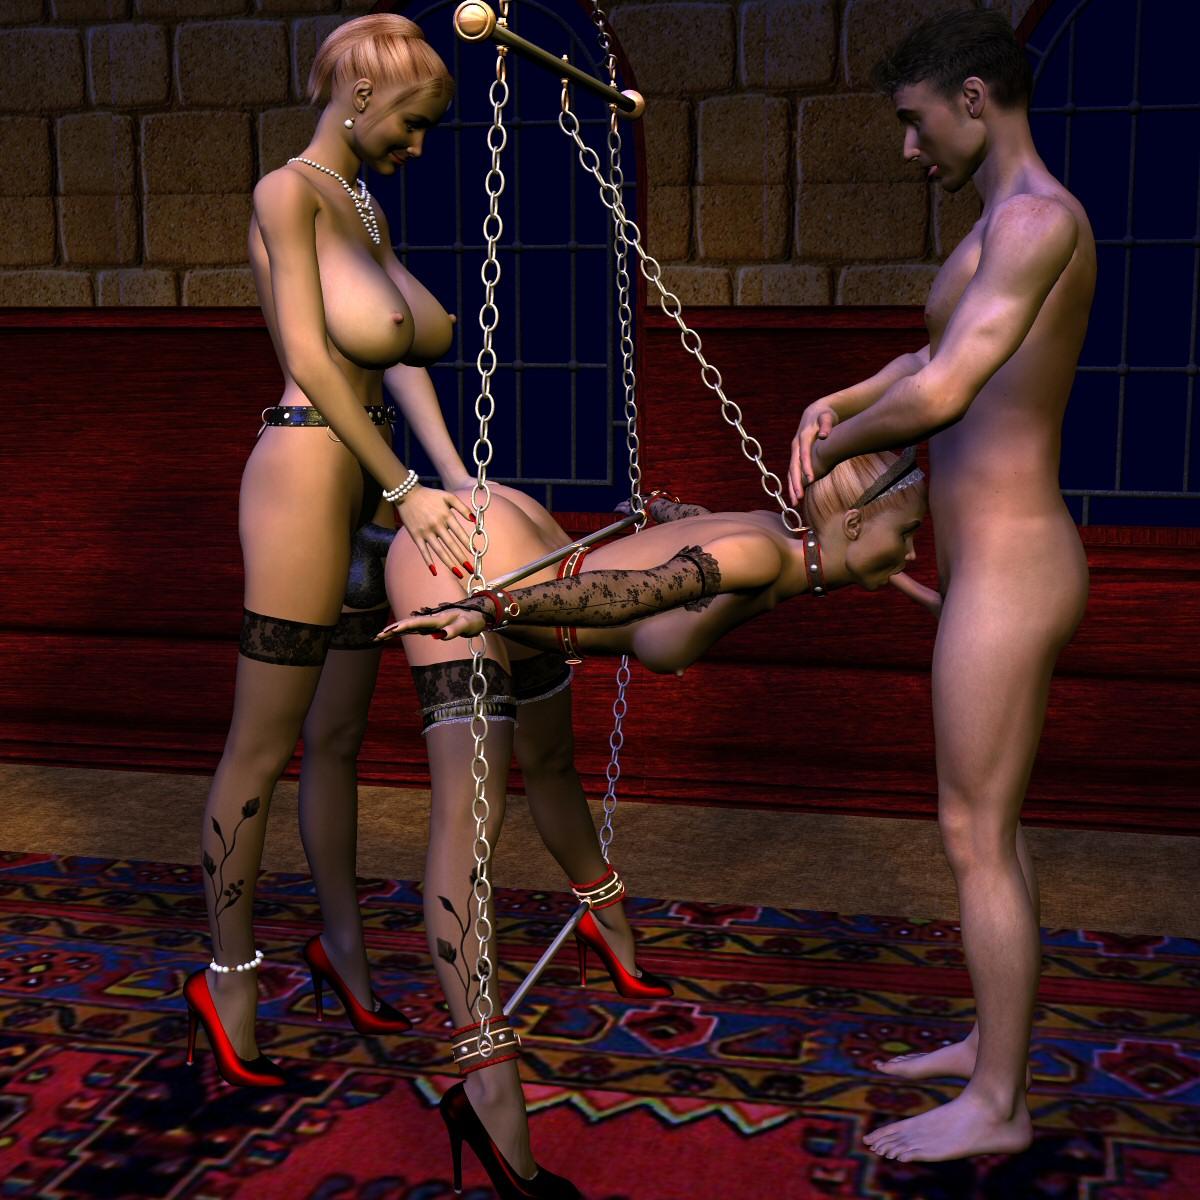 Goblan sex toon porn movies